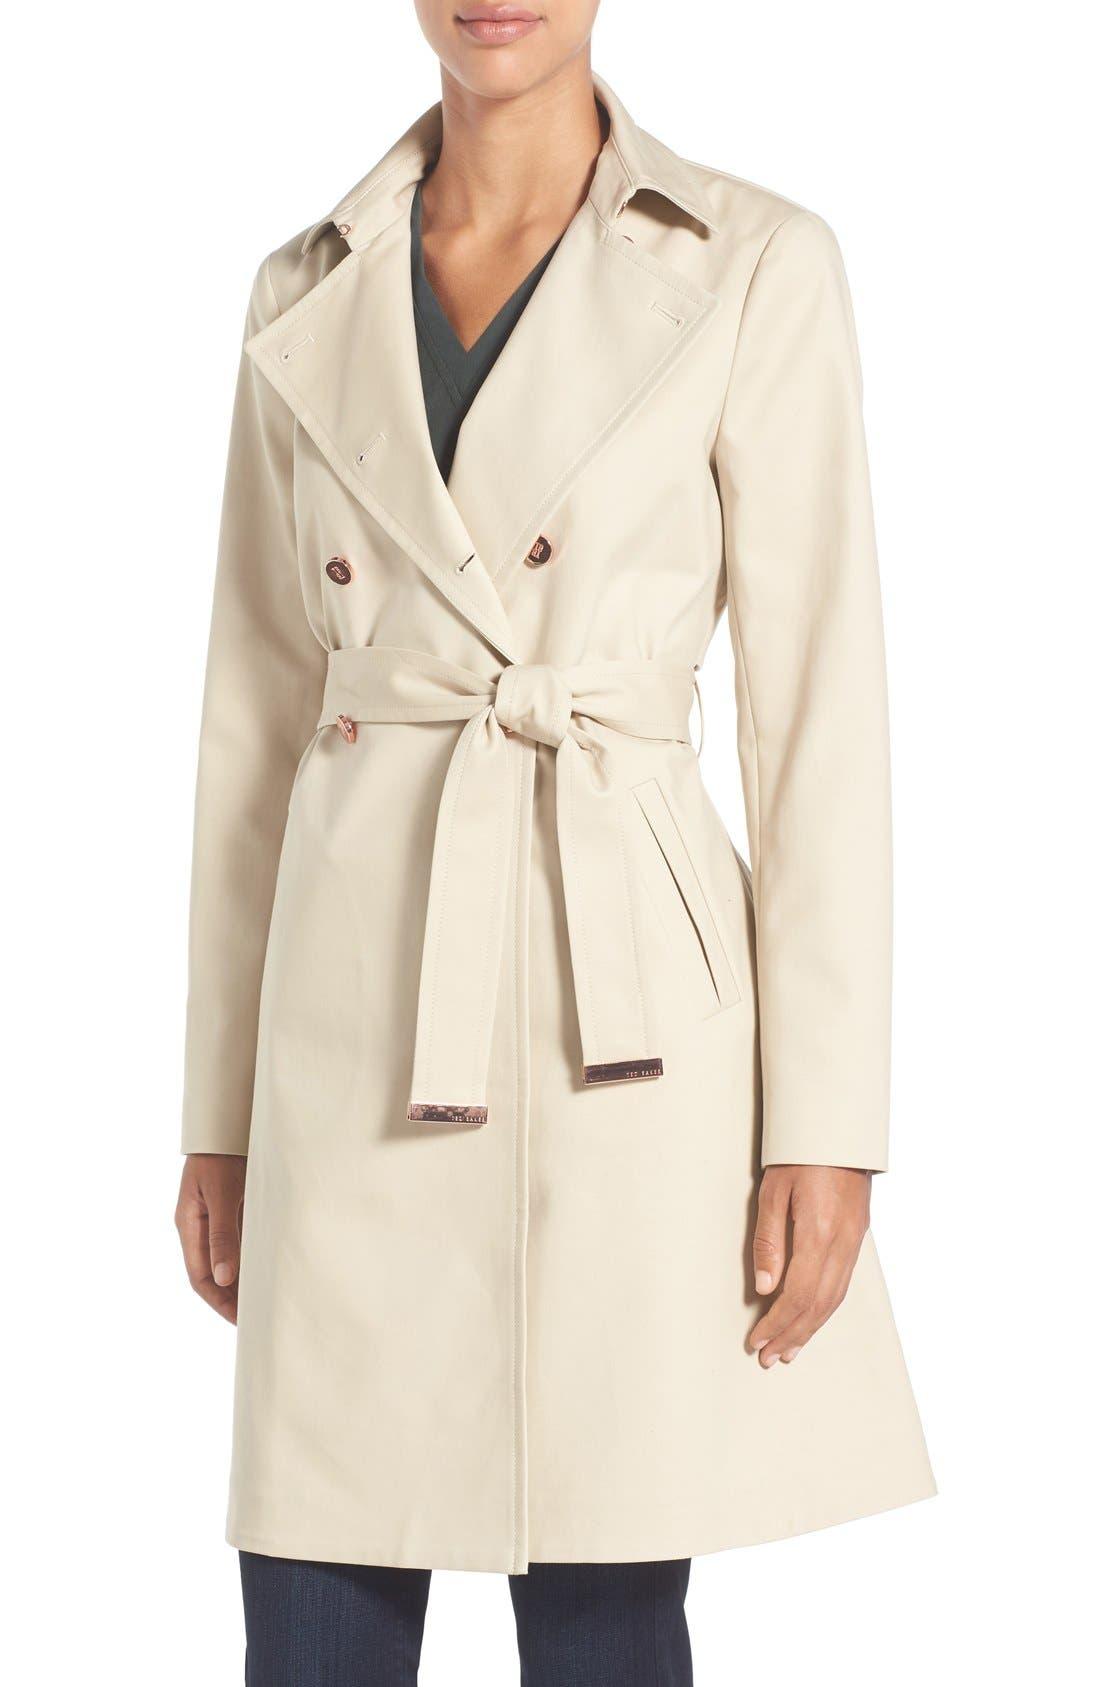 TED BAKER LONDON,                             Flared Skirt Trench Coat,                             Main thumbnail 1, color,                             253